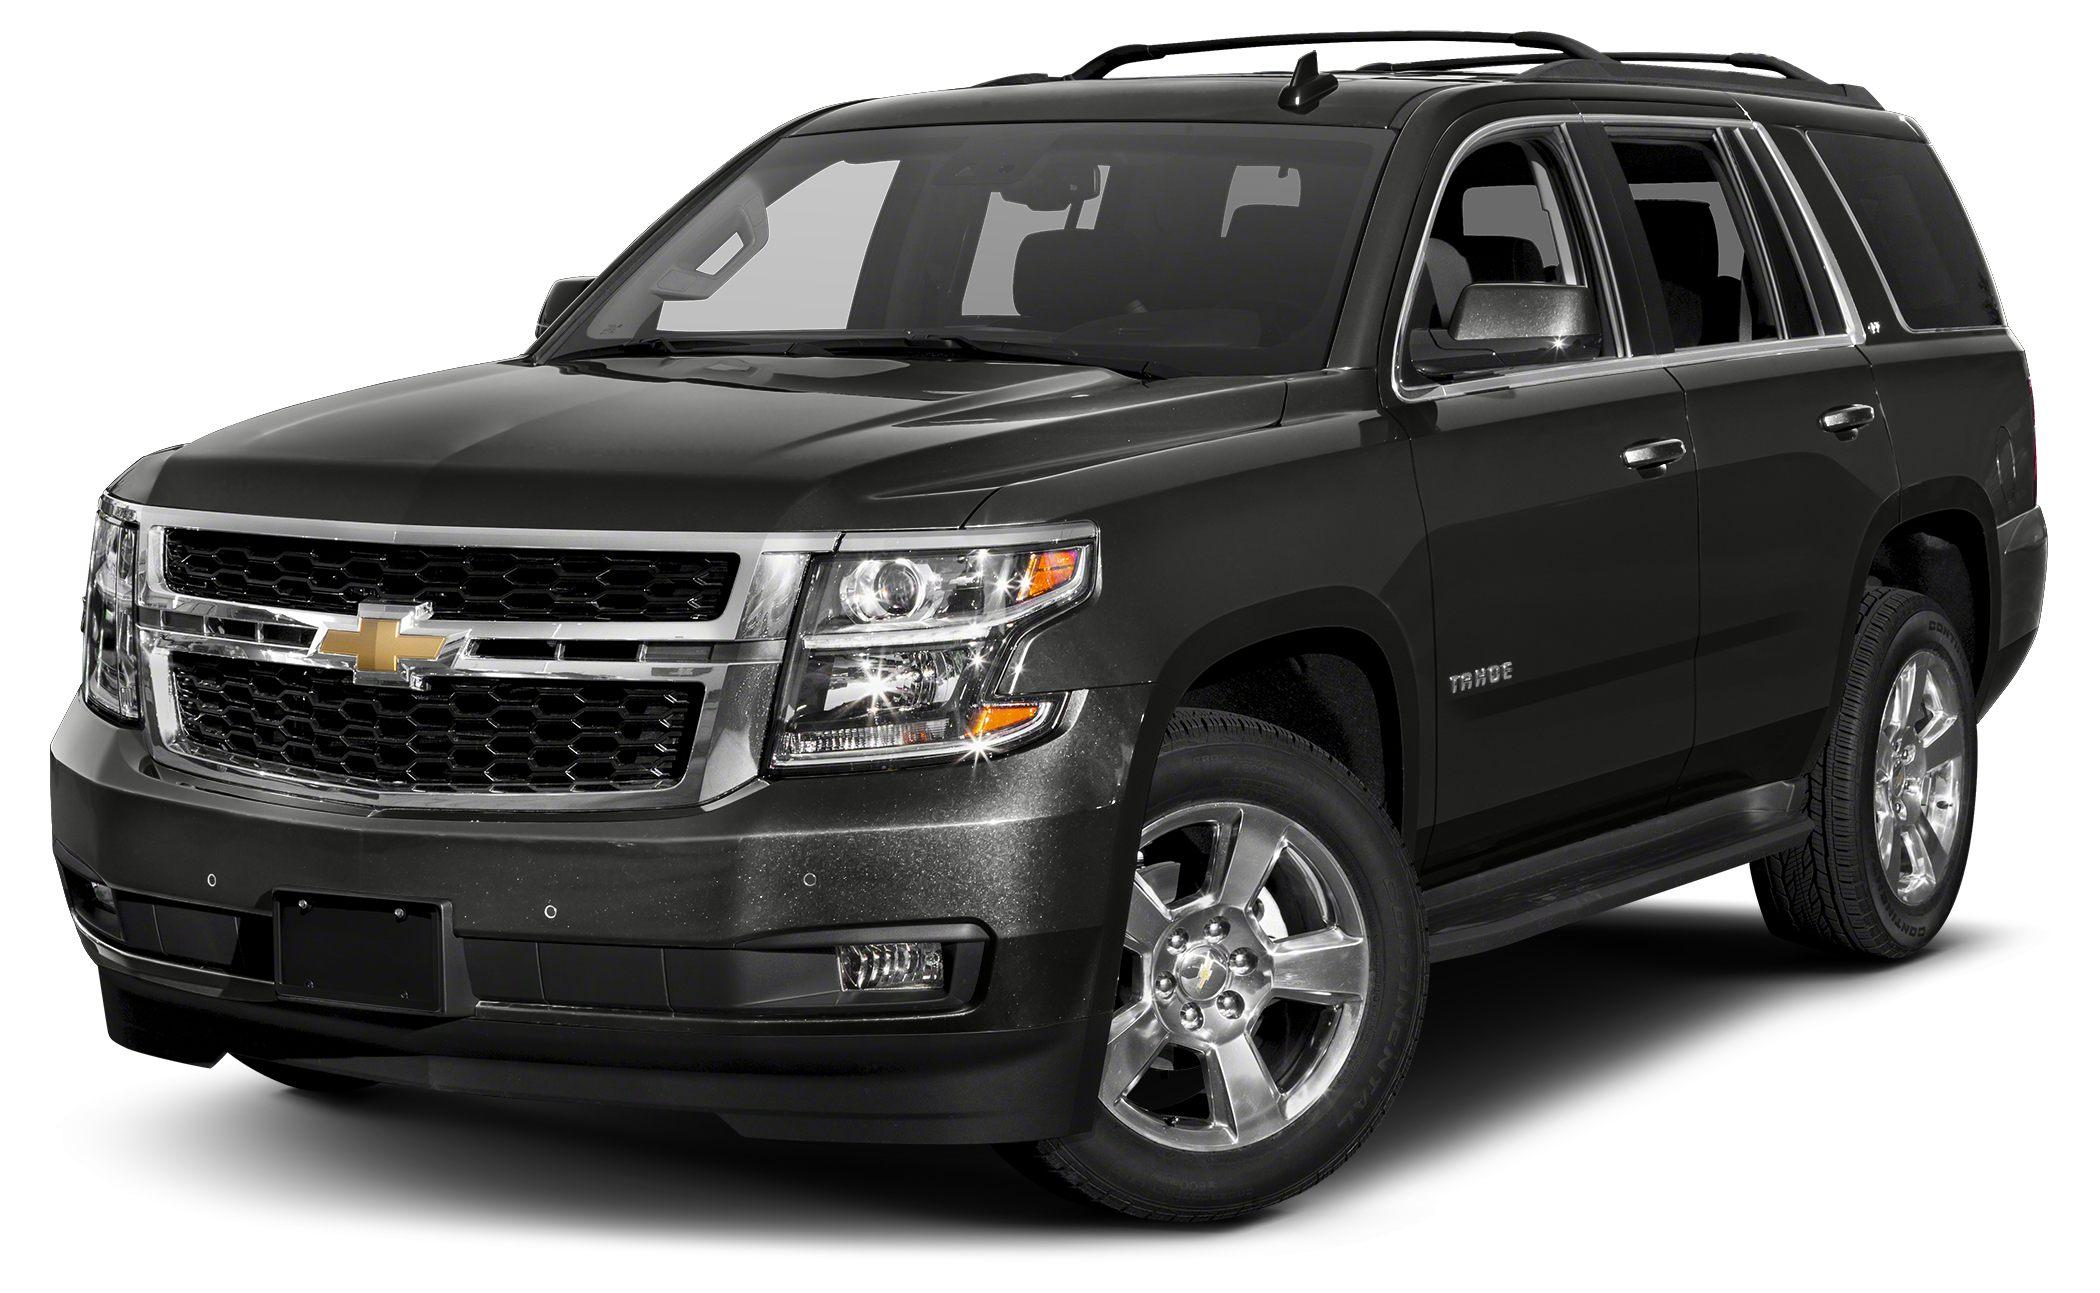 2017 Chevrolet Tahoe LT Miles 5Color Tungsten Metallic Stock 171366 VIN 1GNSCBKC3HR408266